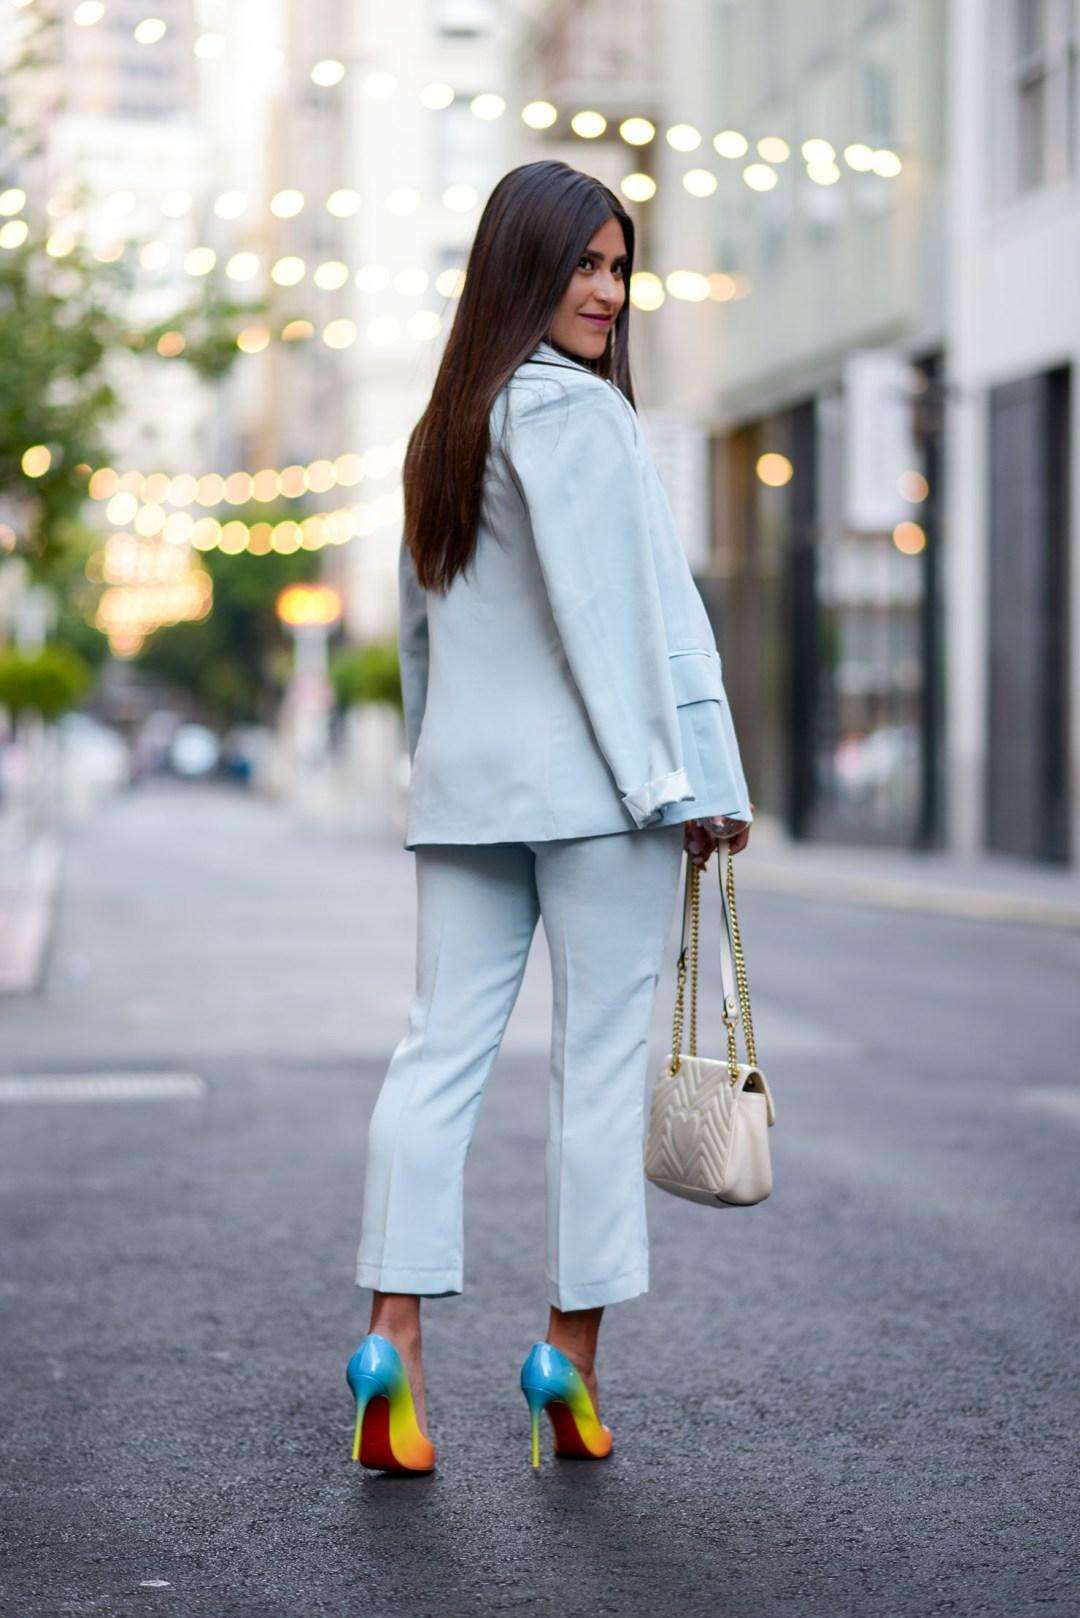 Lifestyle blogger Kelsey Kaplan of Kelsey Kaplan Fashion wearing blue suit and rainbow Christian Louboutin Pigalle Pumps